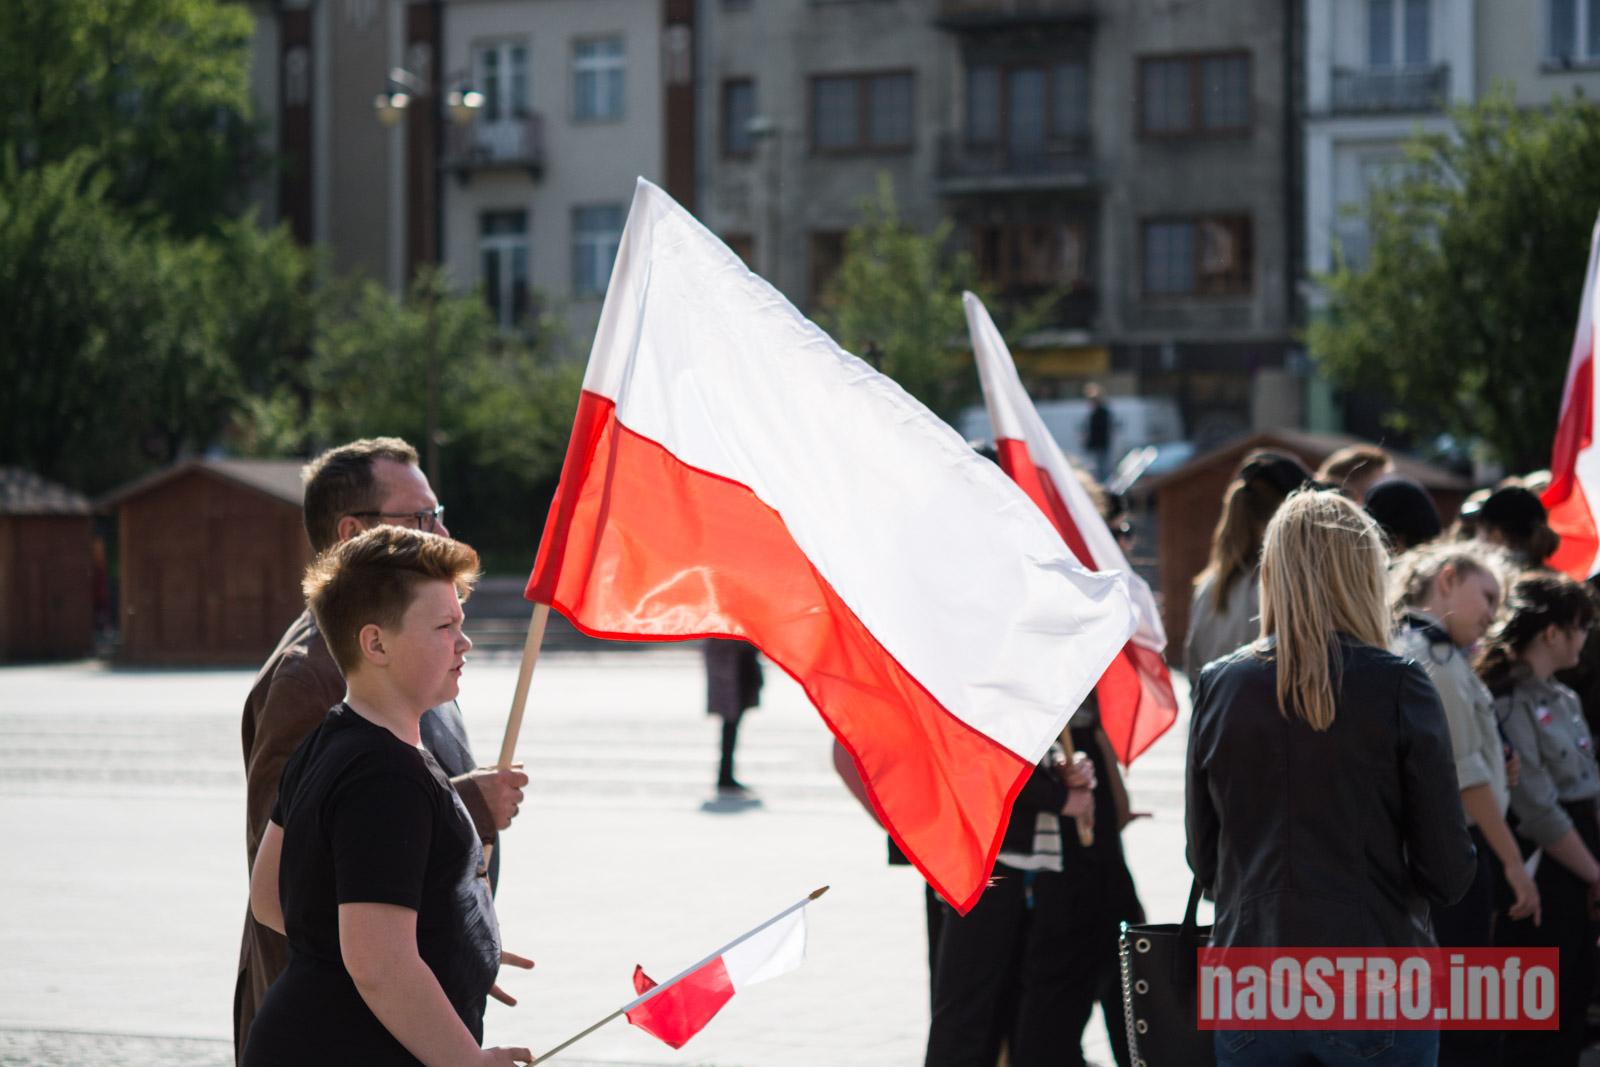 NaOSTRO dzien flagi rynek-28